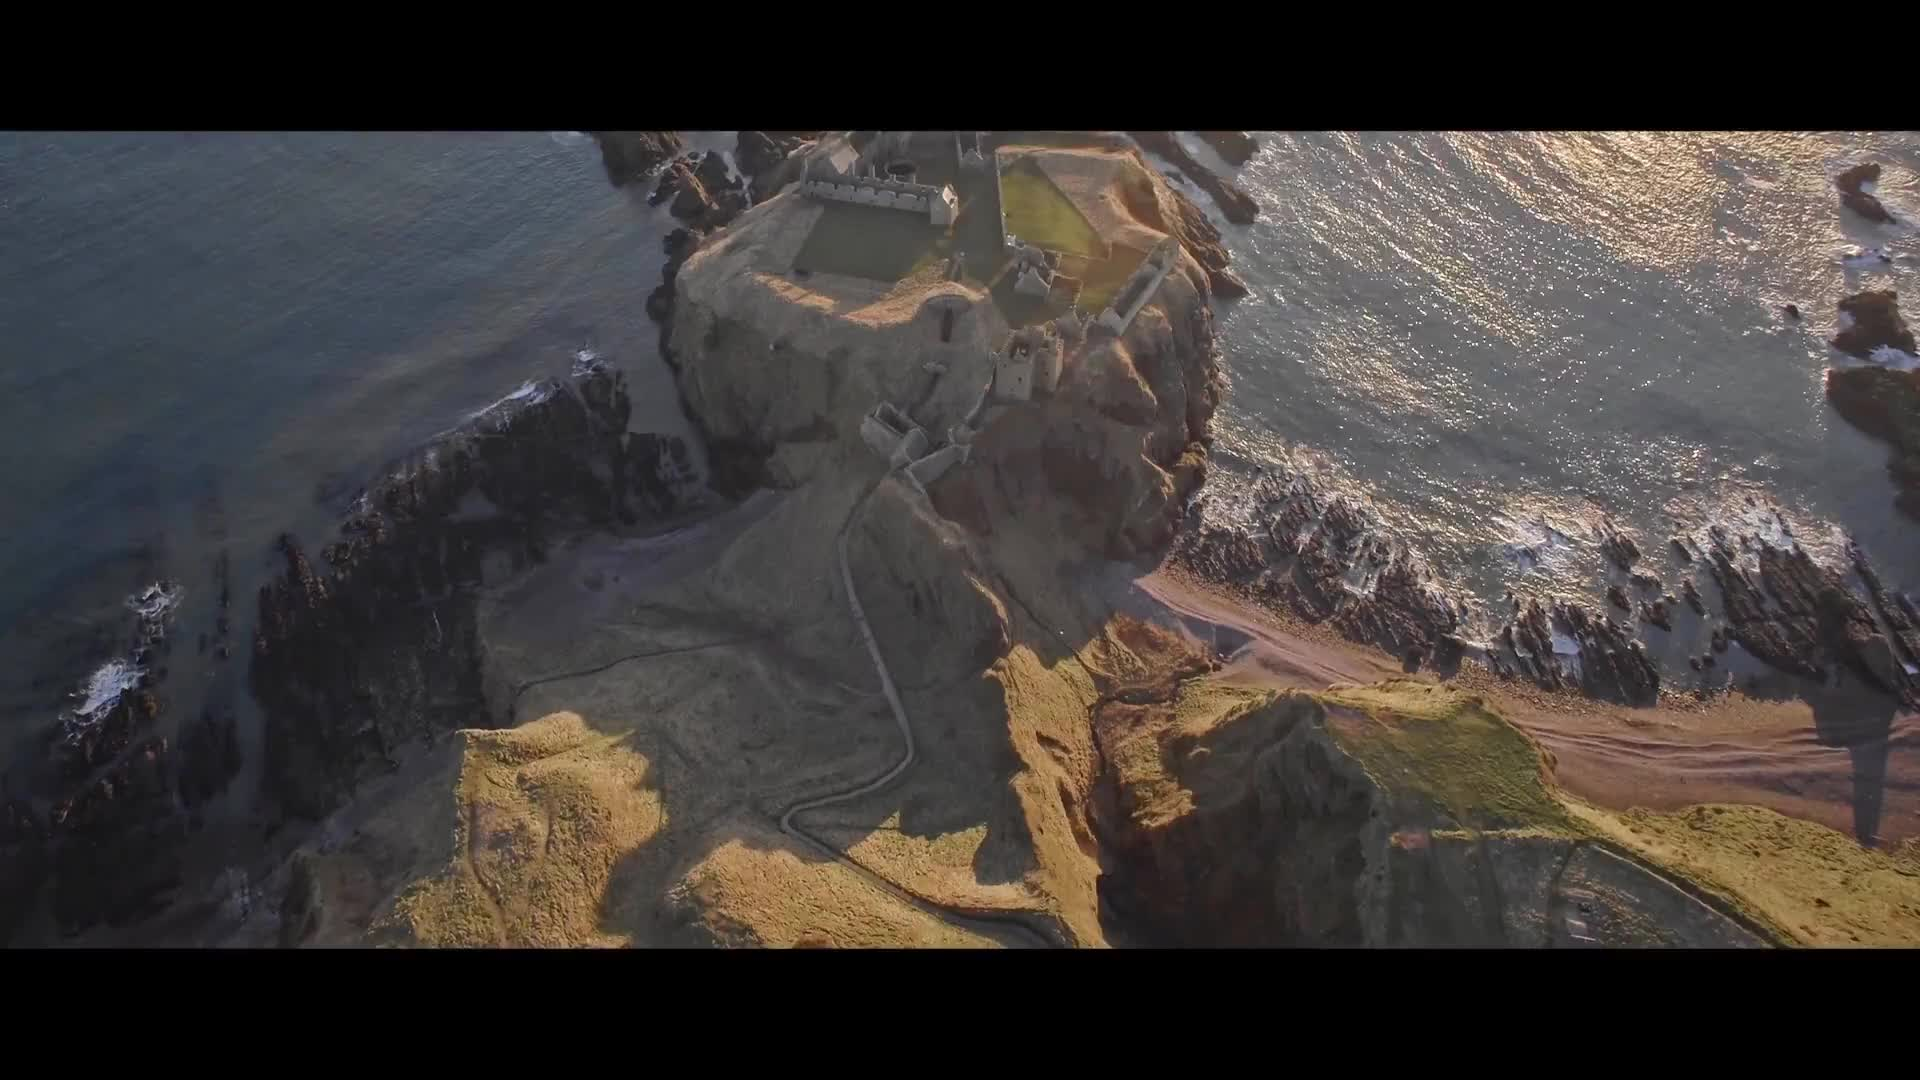 John Duncan, People & Blogs, drone, scotland, scottish, st kilda, suilven, sunrise, x5s, x7, Ancient Scotland GIFs